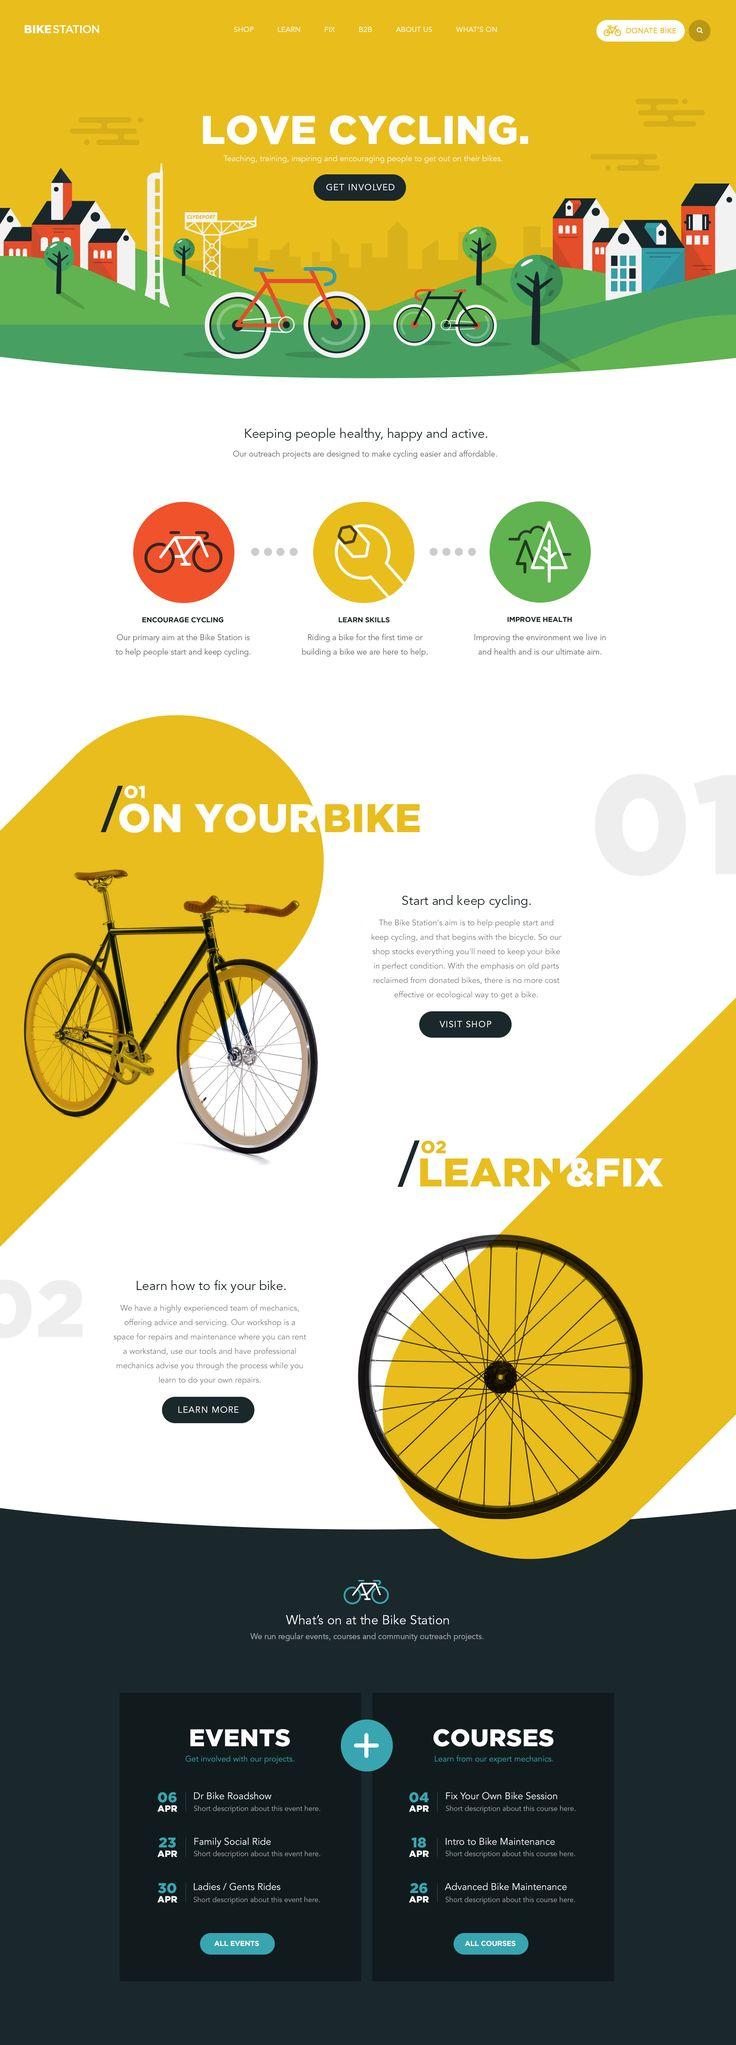 Bike station desktop wide